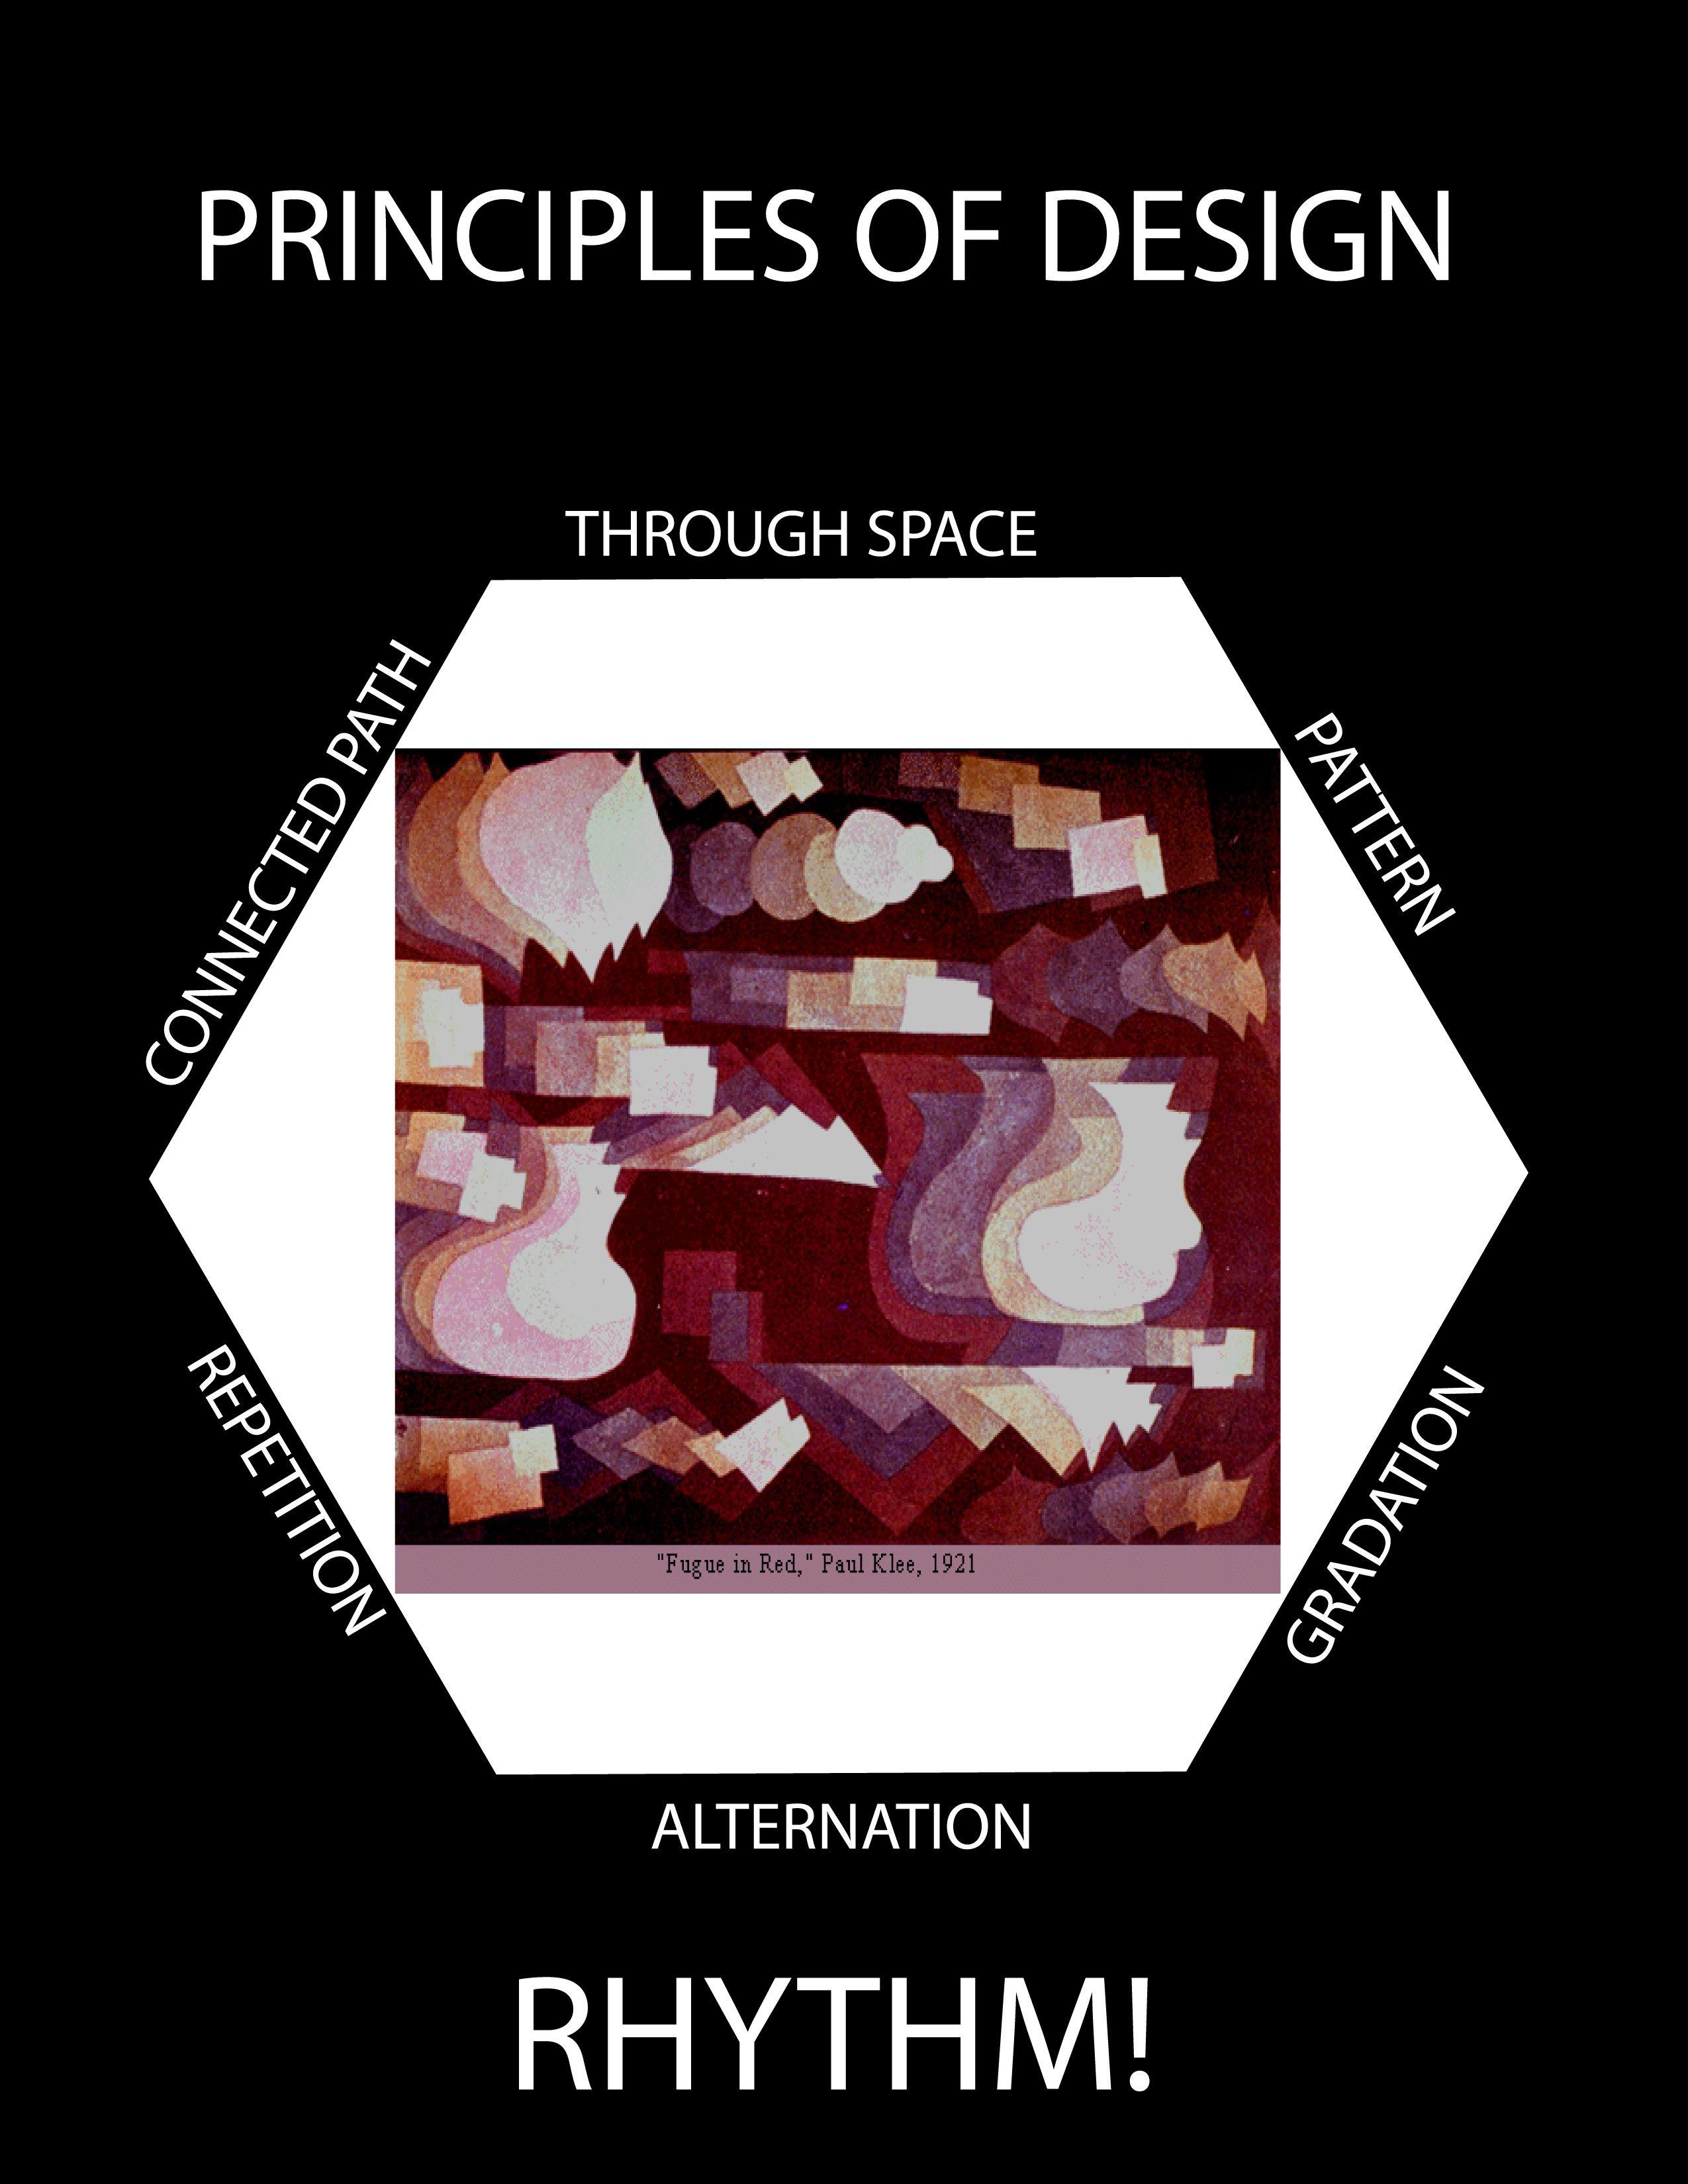 Final Principles Of Design Posters